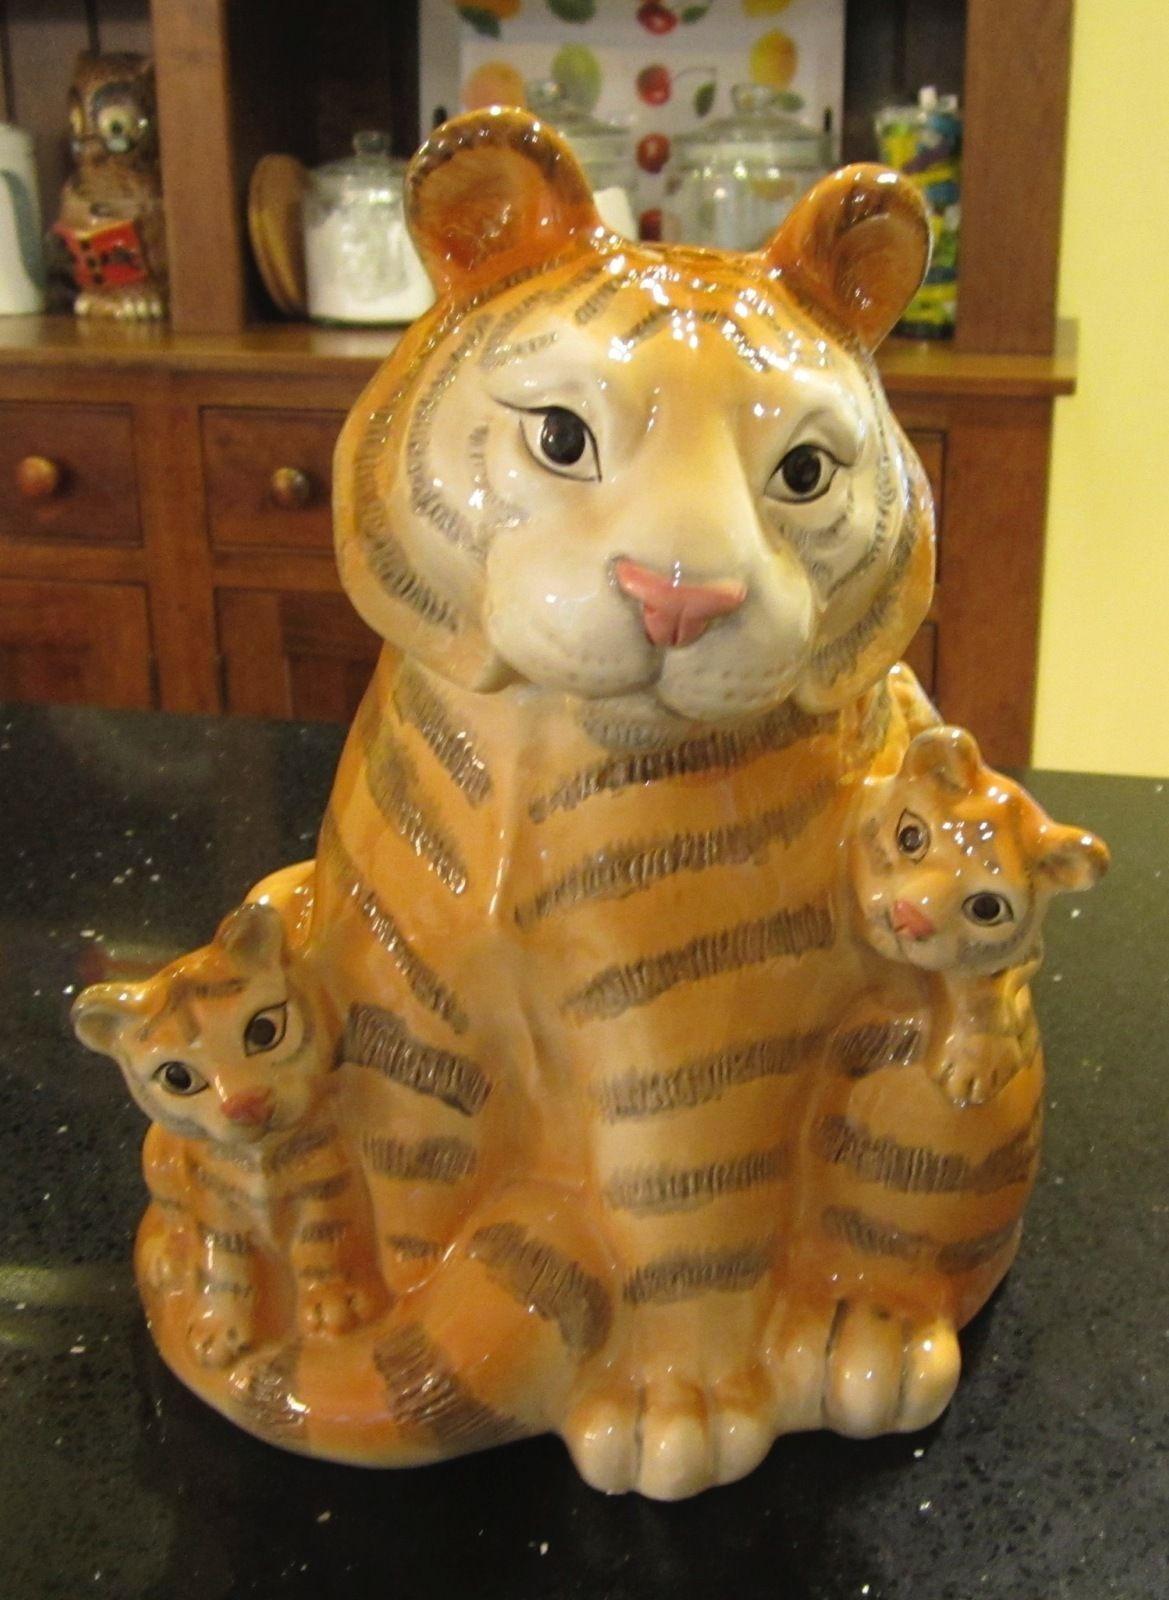 OCI Omnibus div Fitz & Floyd TIger Mother Cub Vintage Cookie Biscuit Jar  Ceramic | eBay